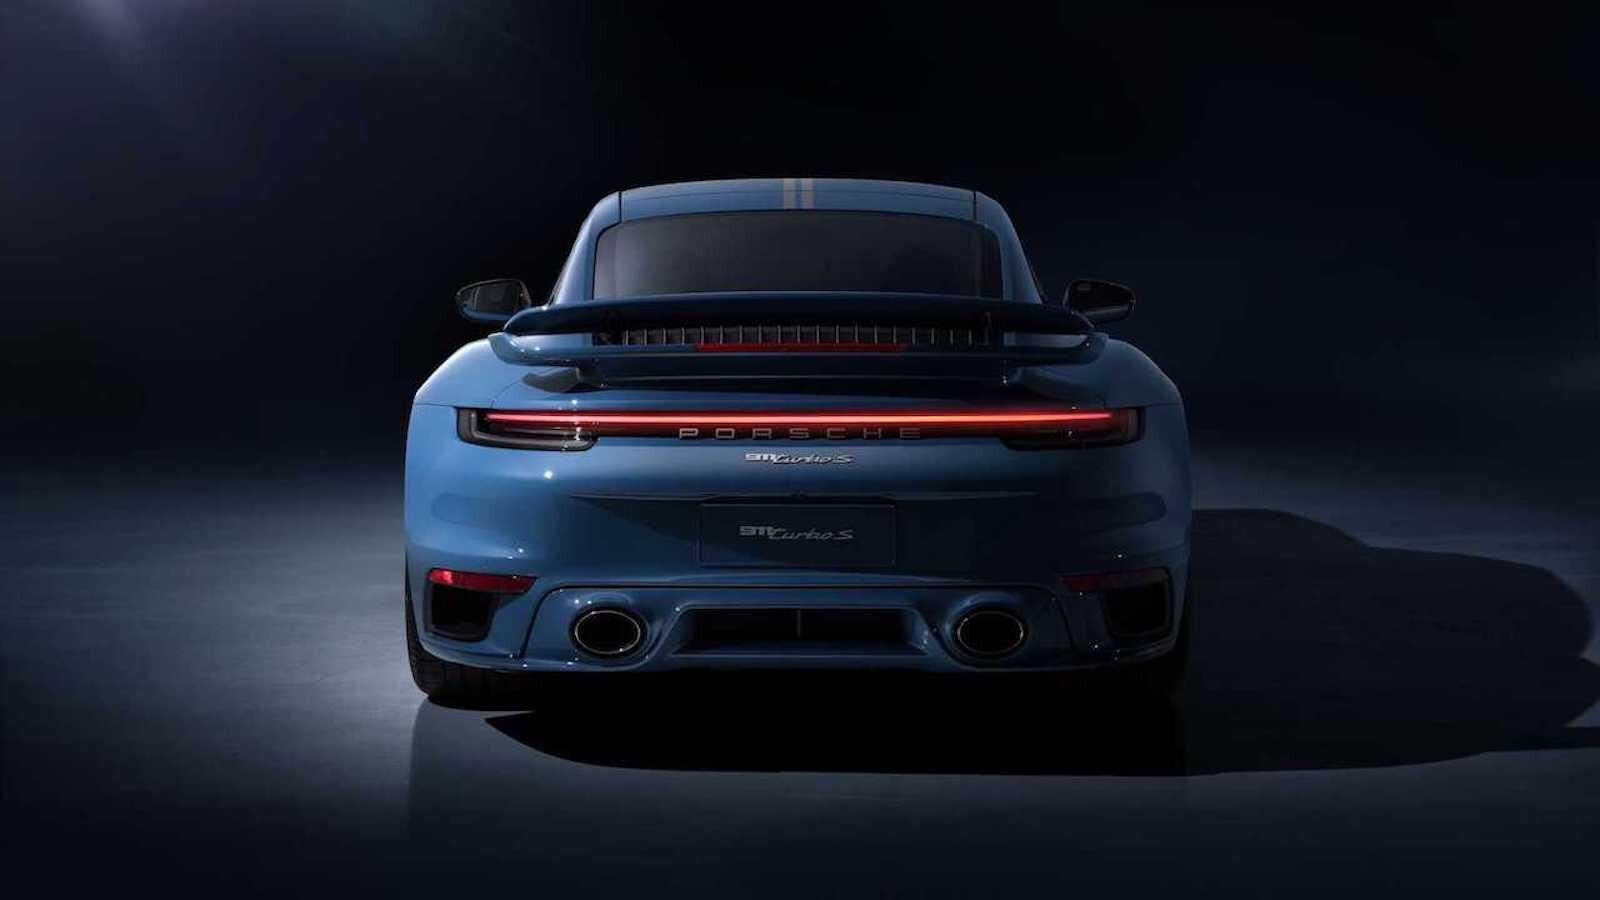 Foto de Porsche 911 20 Aniversario en China (4/9)